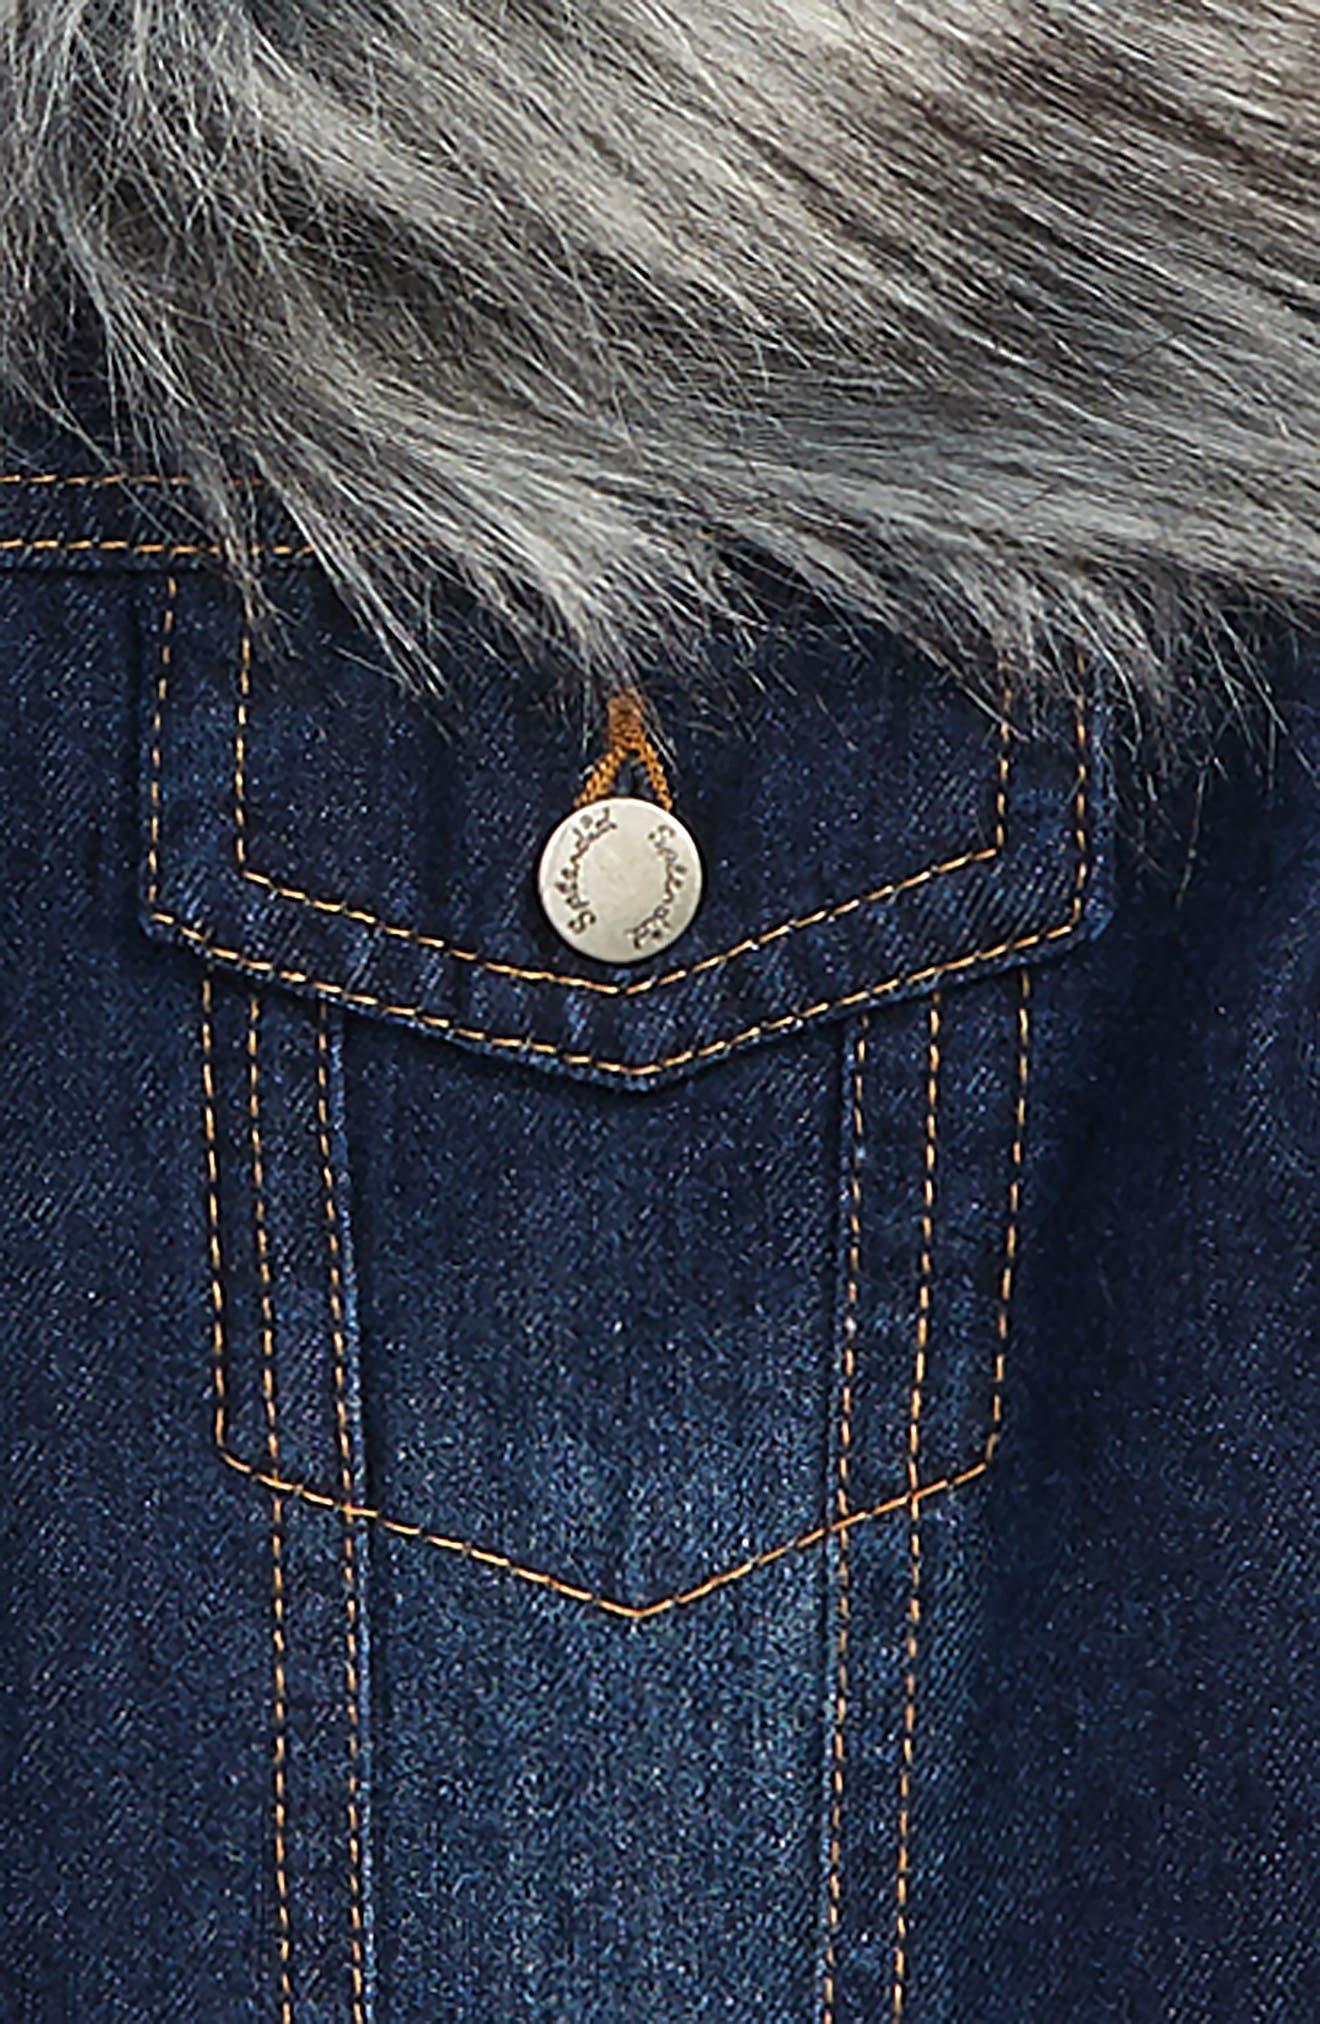 Faux Fur Collar Denim Jacket,                             Alternate thumbnail 2, color,                             MEDIUM STONE